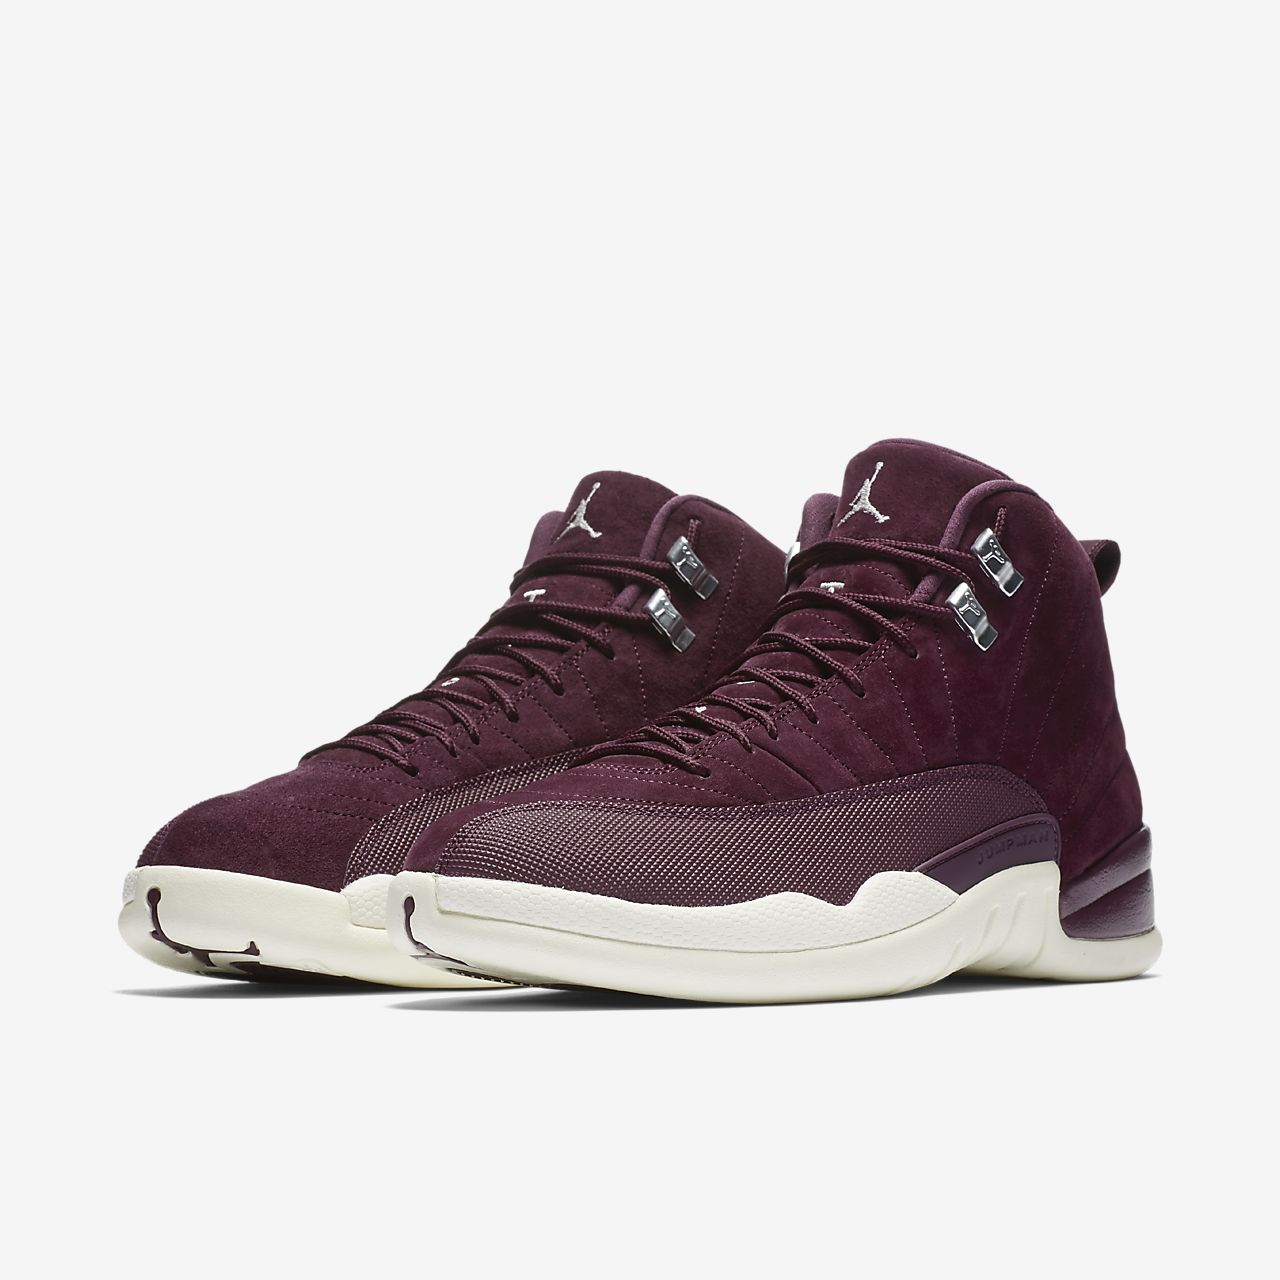 Jordan  Retro Shoes Pink And Black